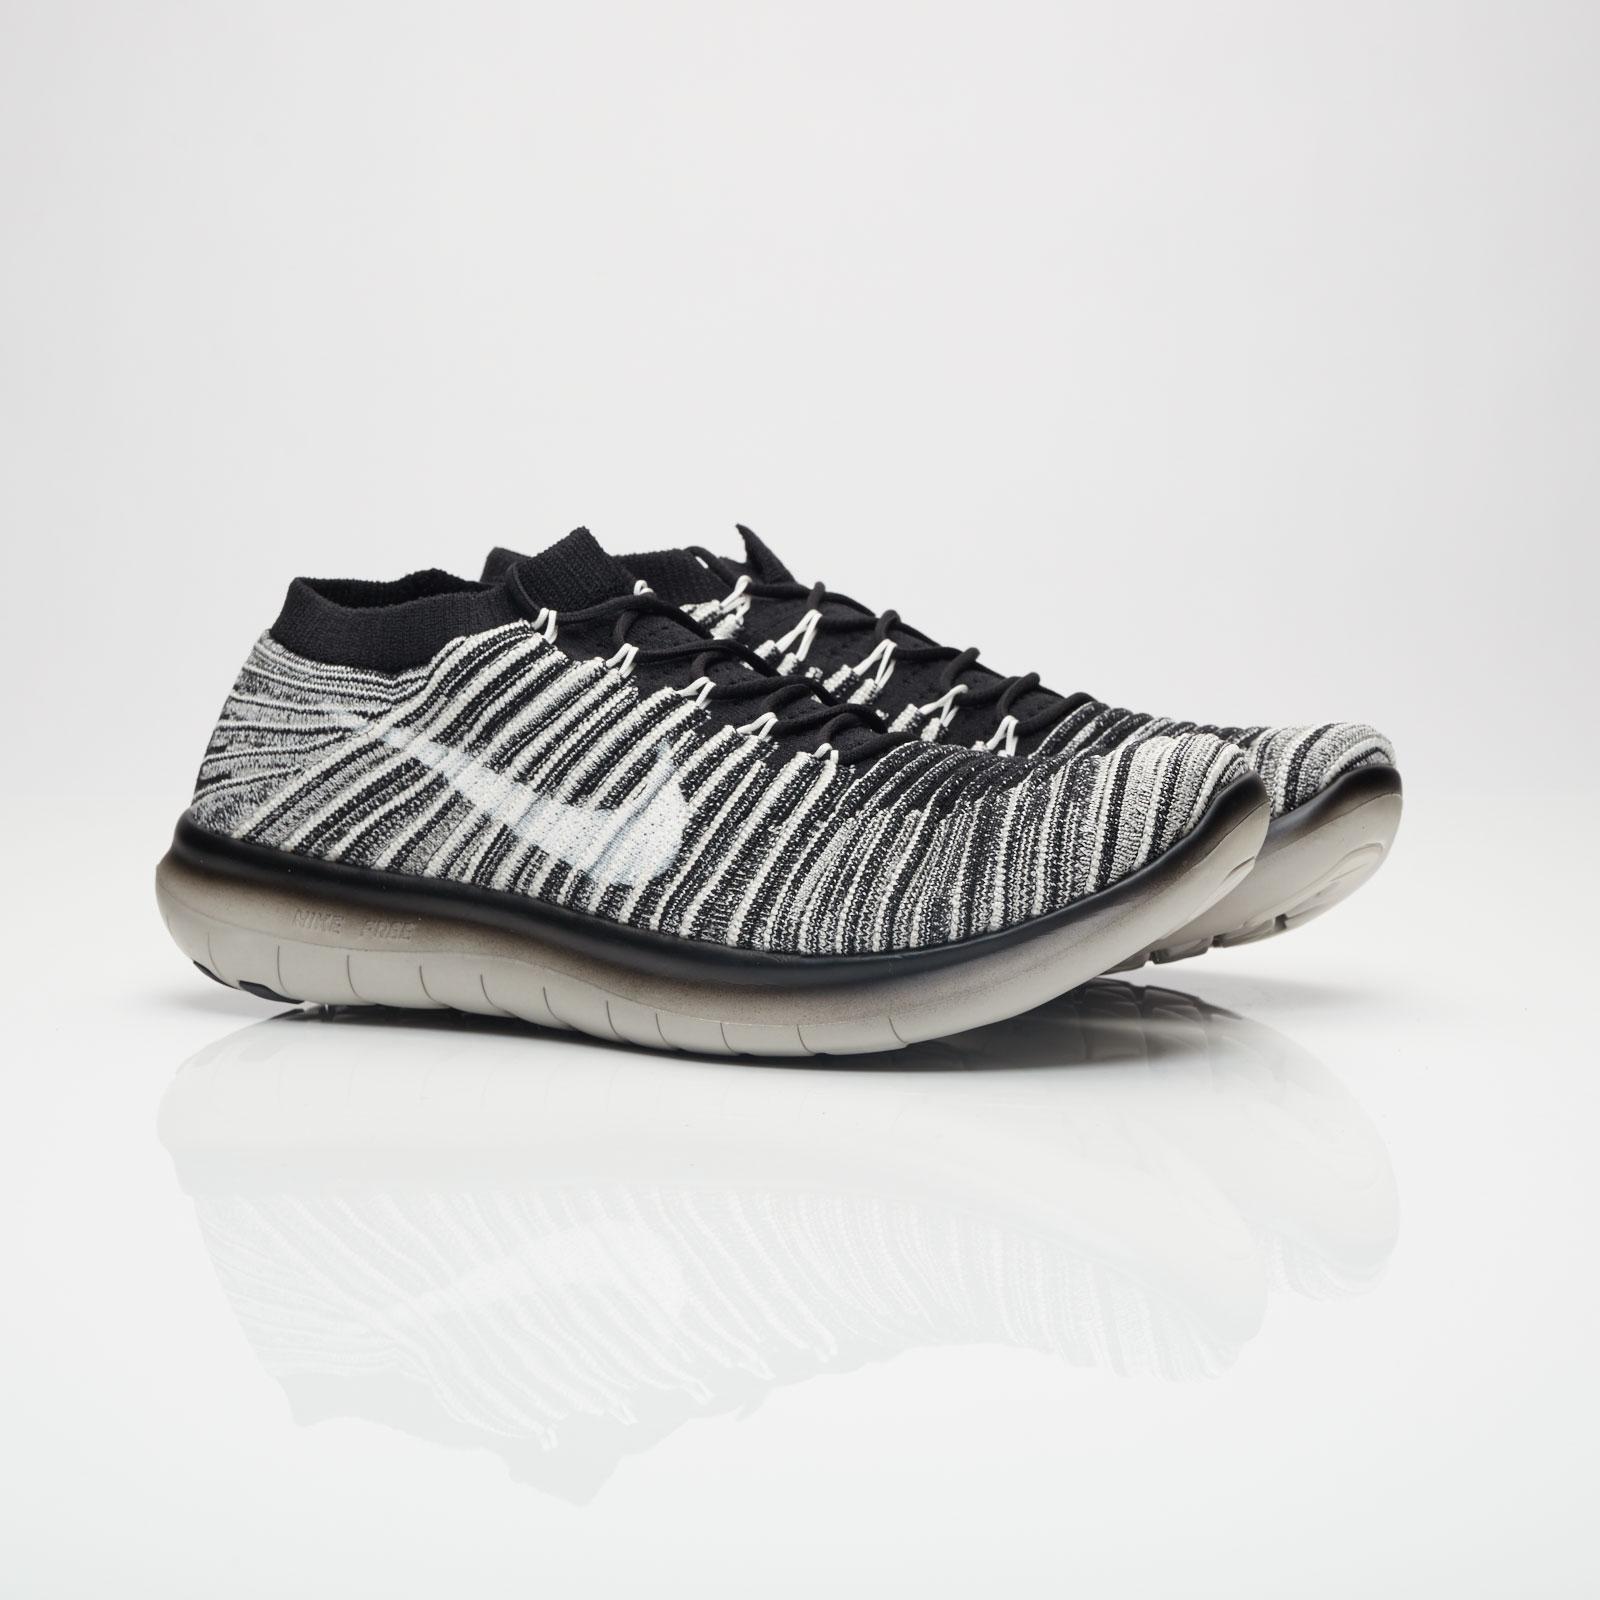 887af79851acc Nike Free Rn Motion Flyknit - 847659-001 - Sneakersnstuff